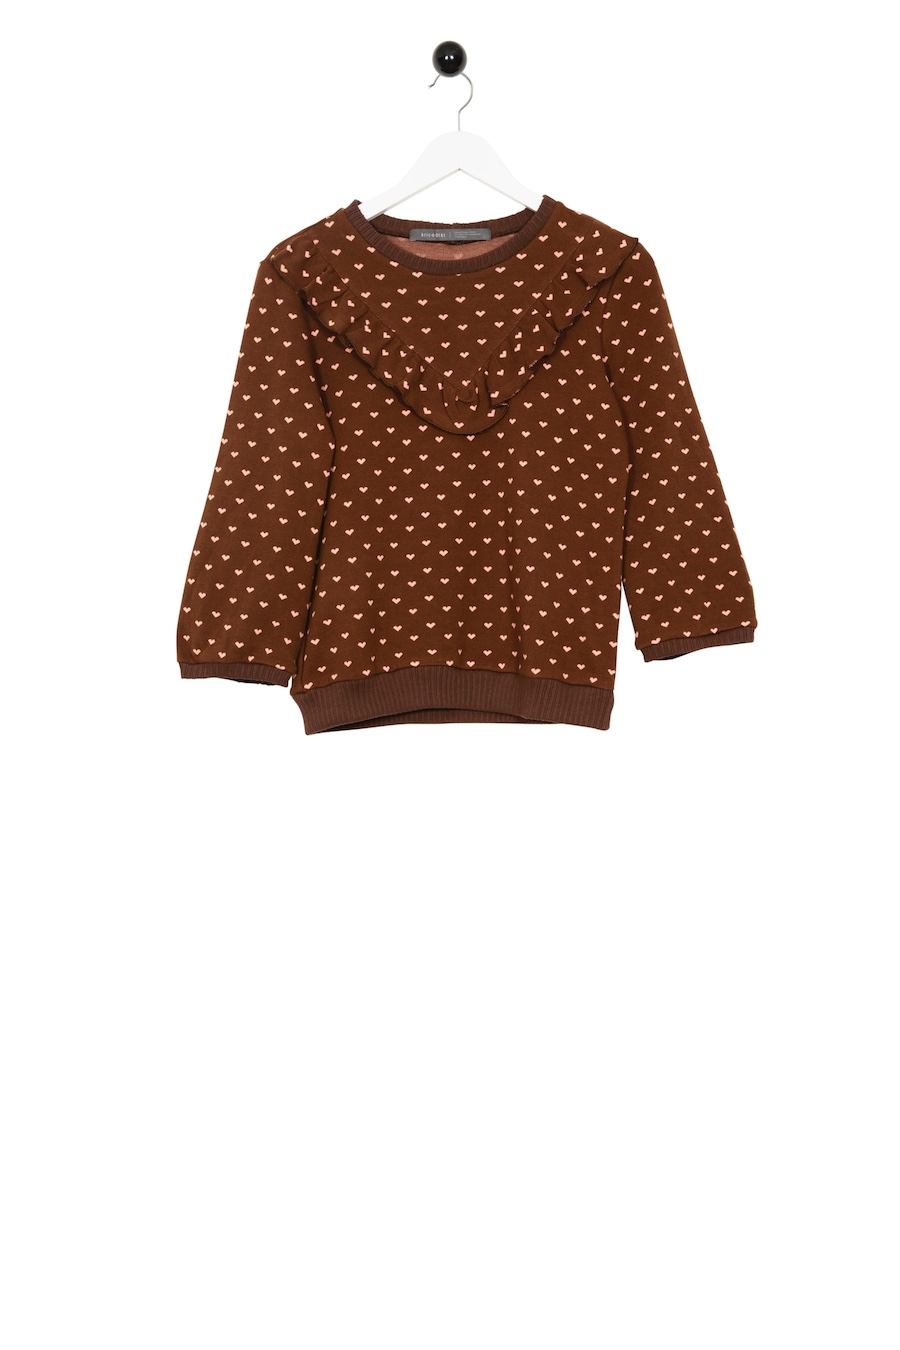 Ardenner Sweater